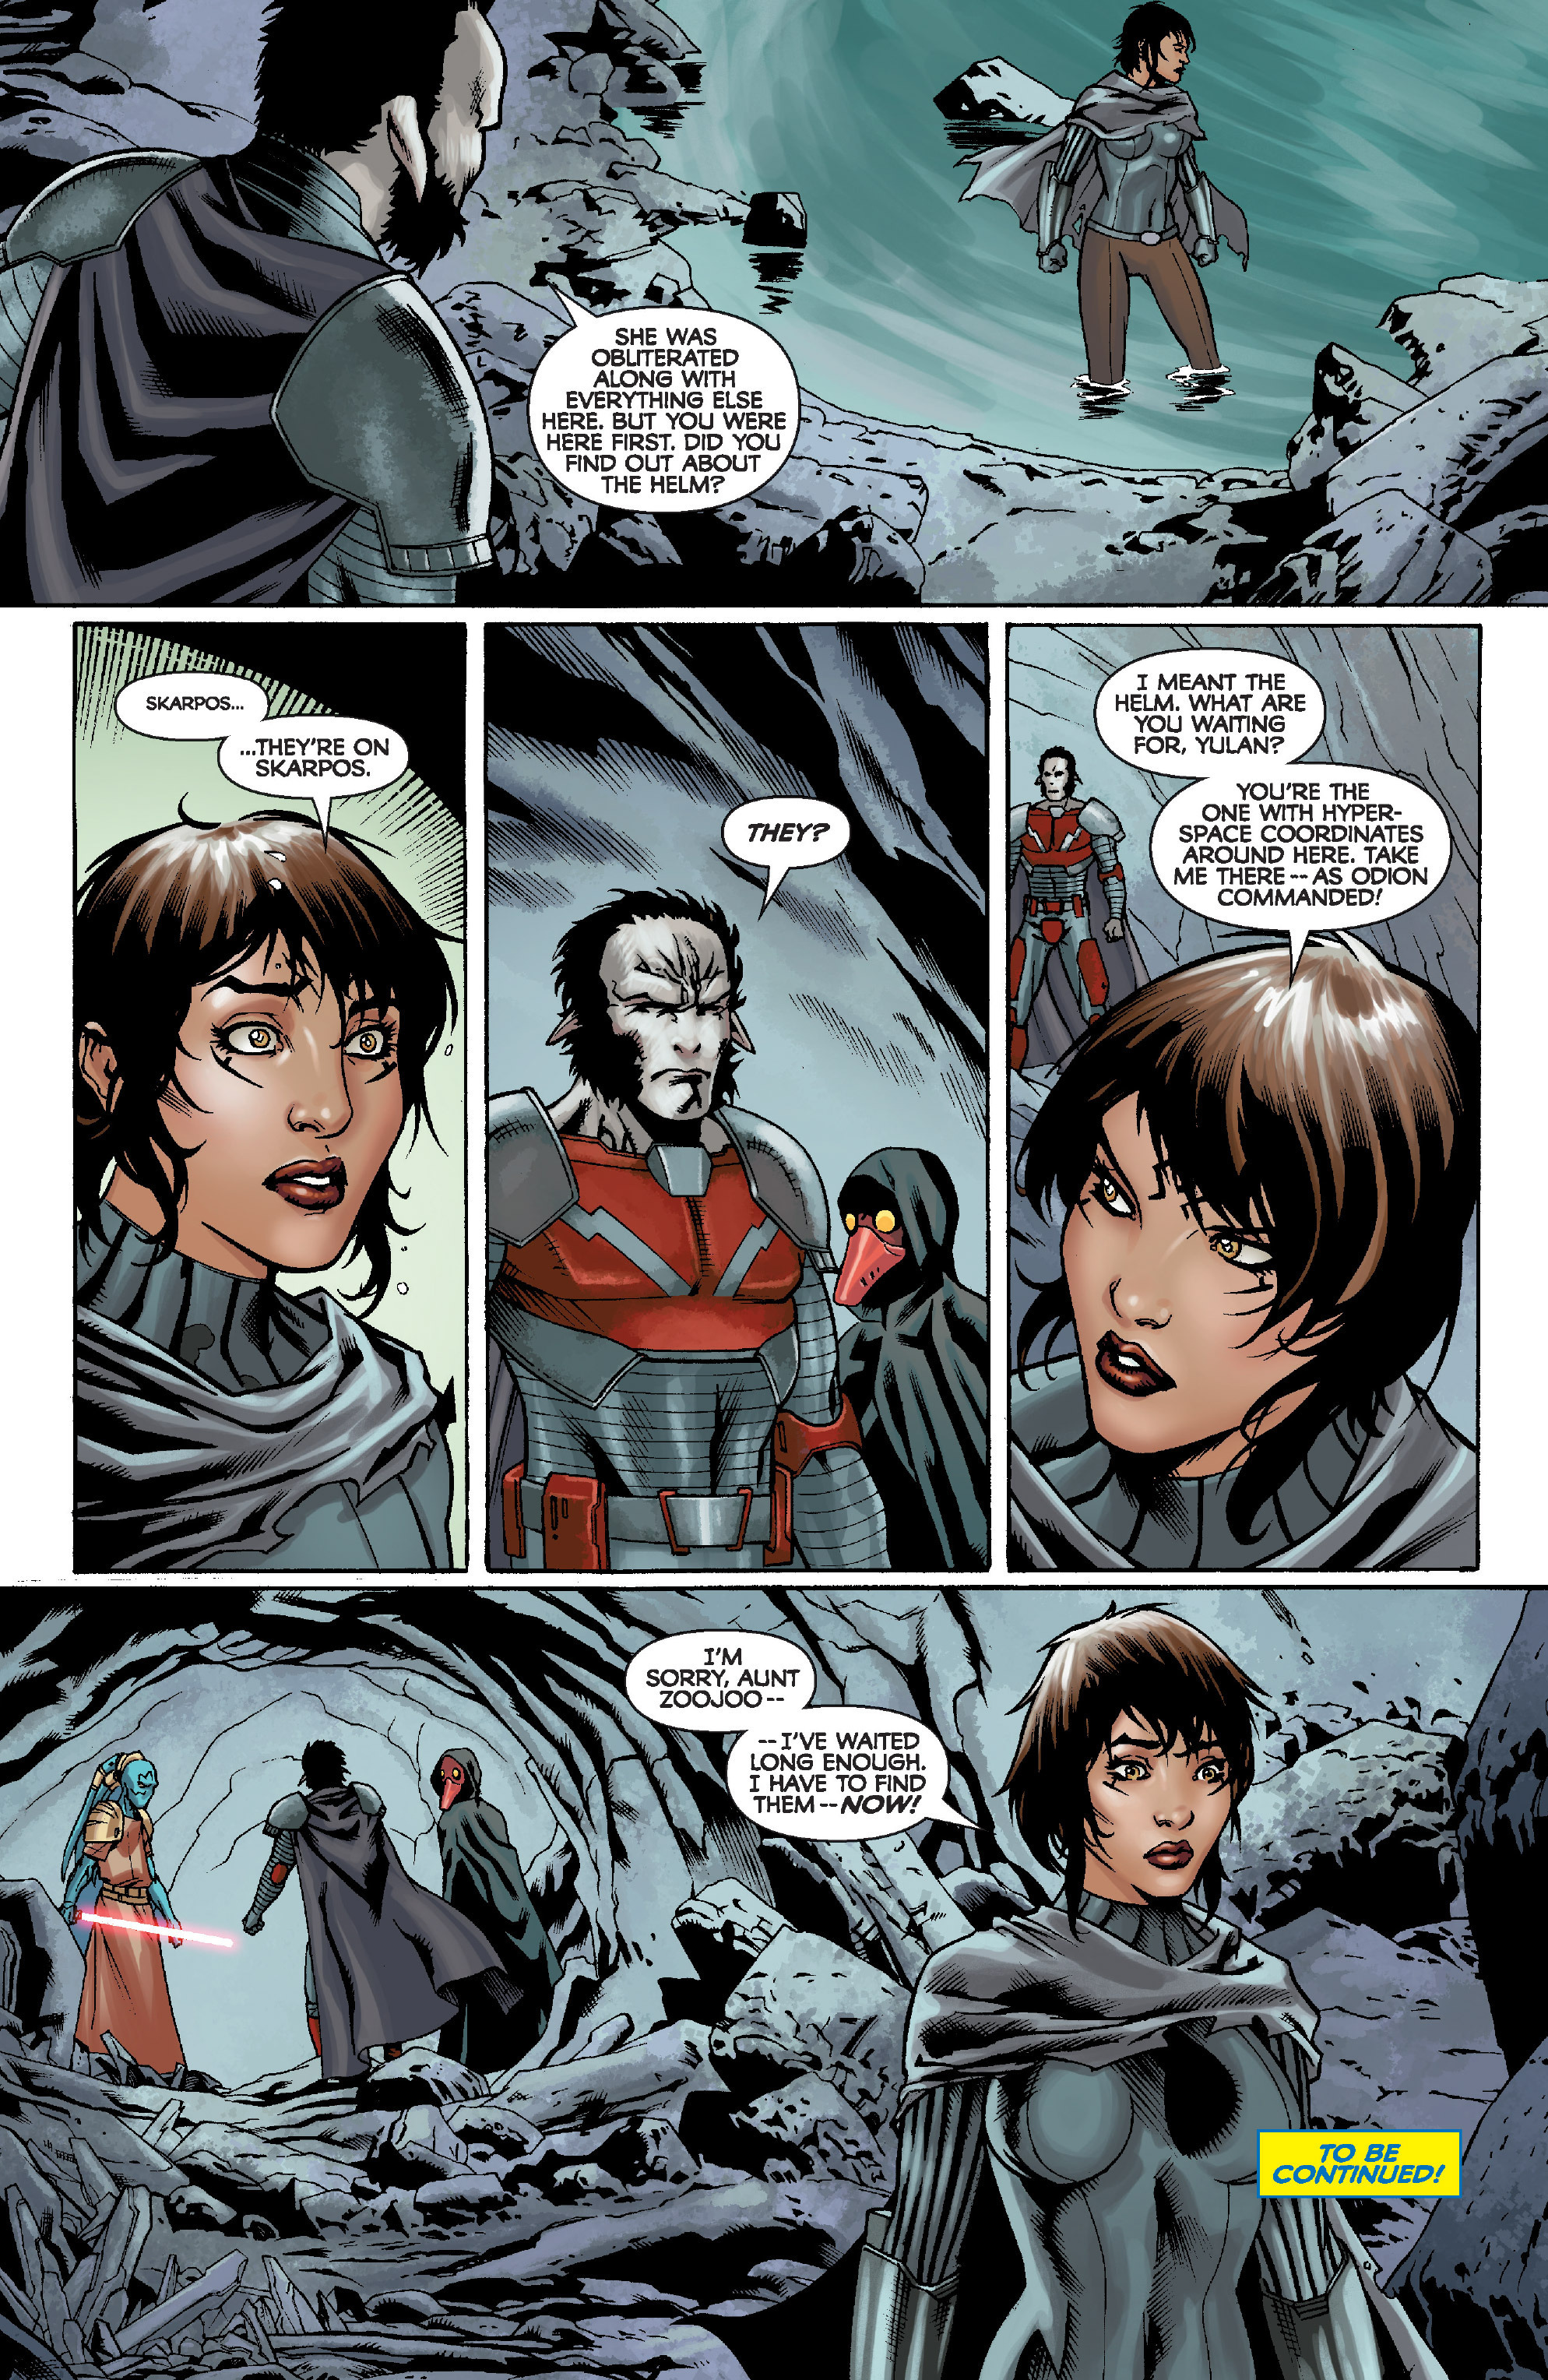 Read online Star Wars: Knight Errant - Escape comic -  Issue #2 - 24